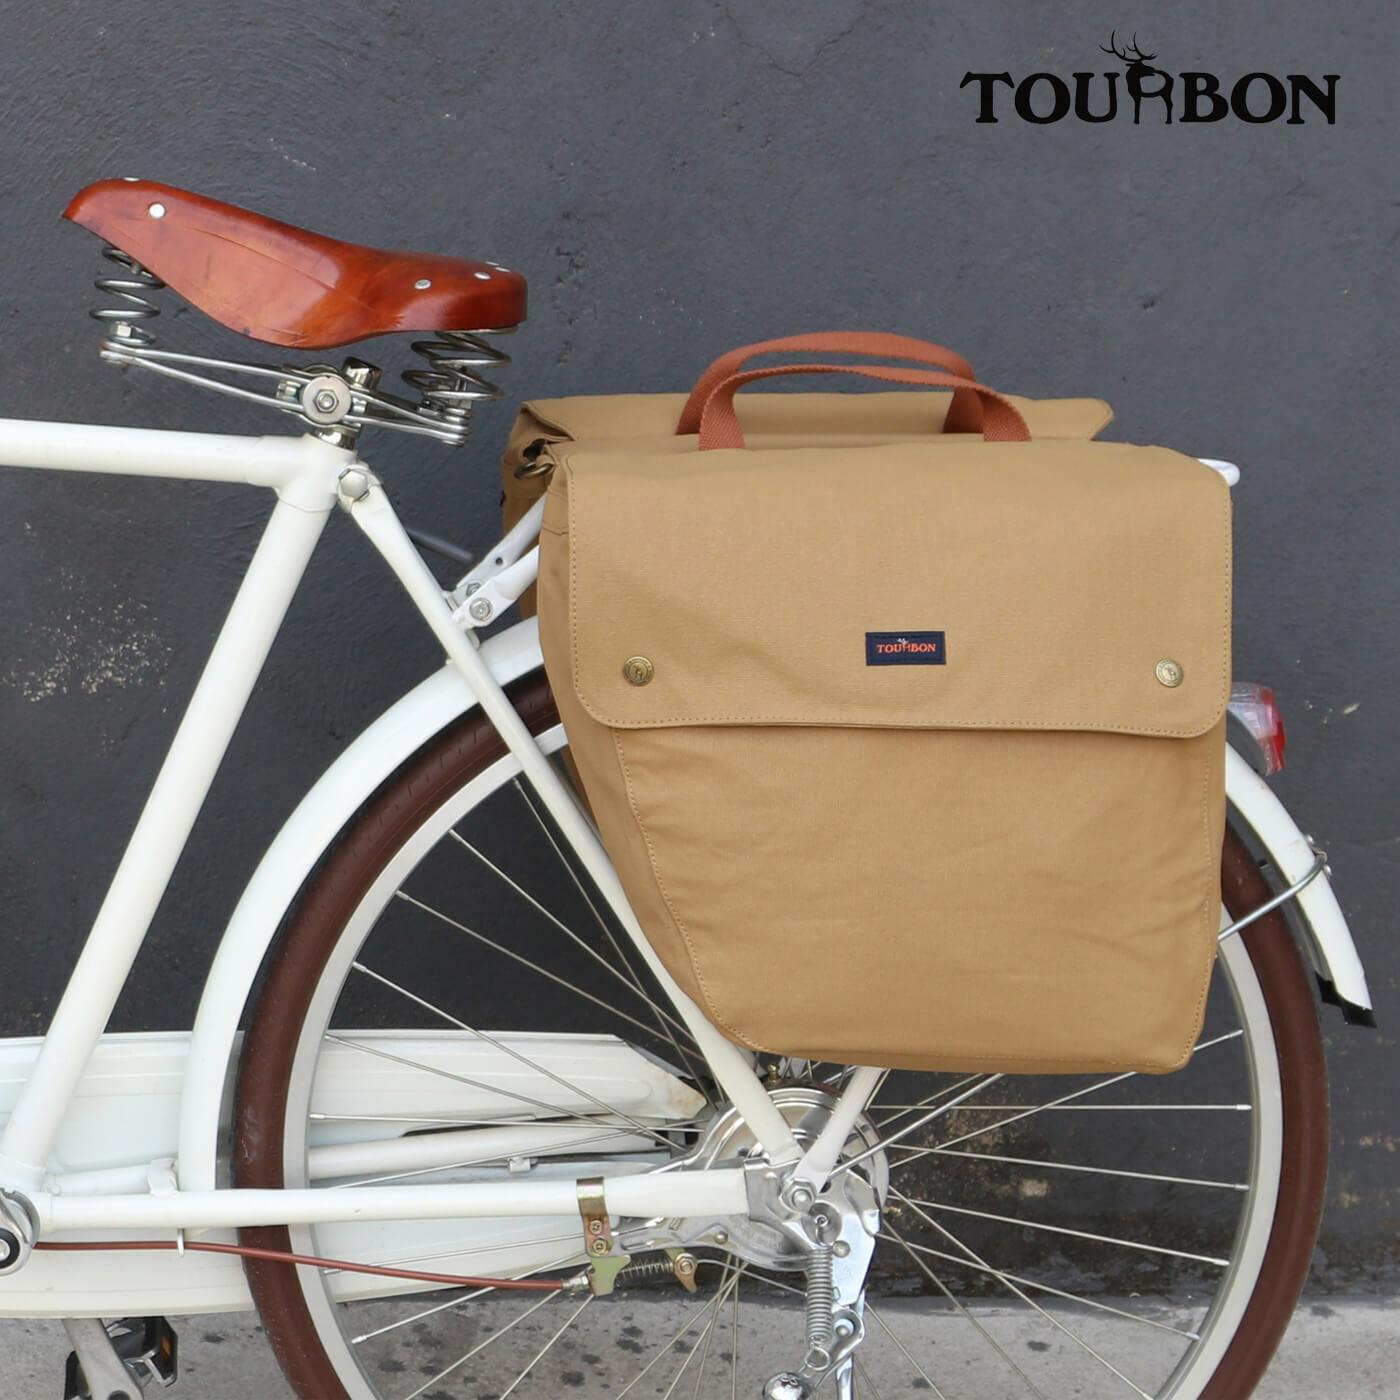 Tourbon Alforjas bicicleta con correa para hombro ajustable Asiento Posterior Bicicleta Rack bolsa